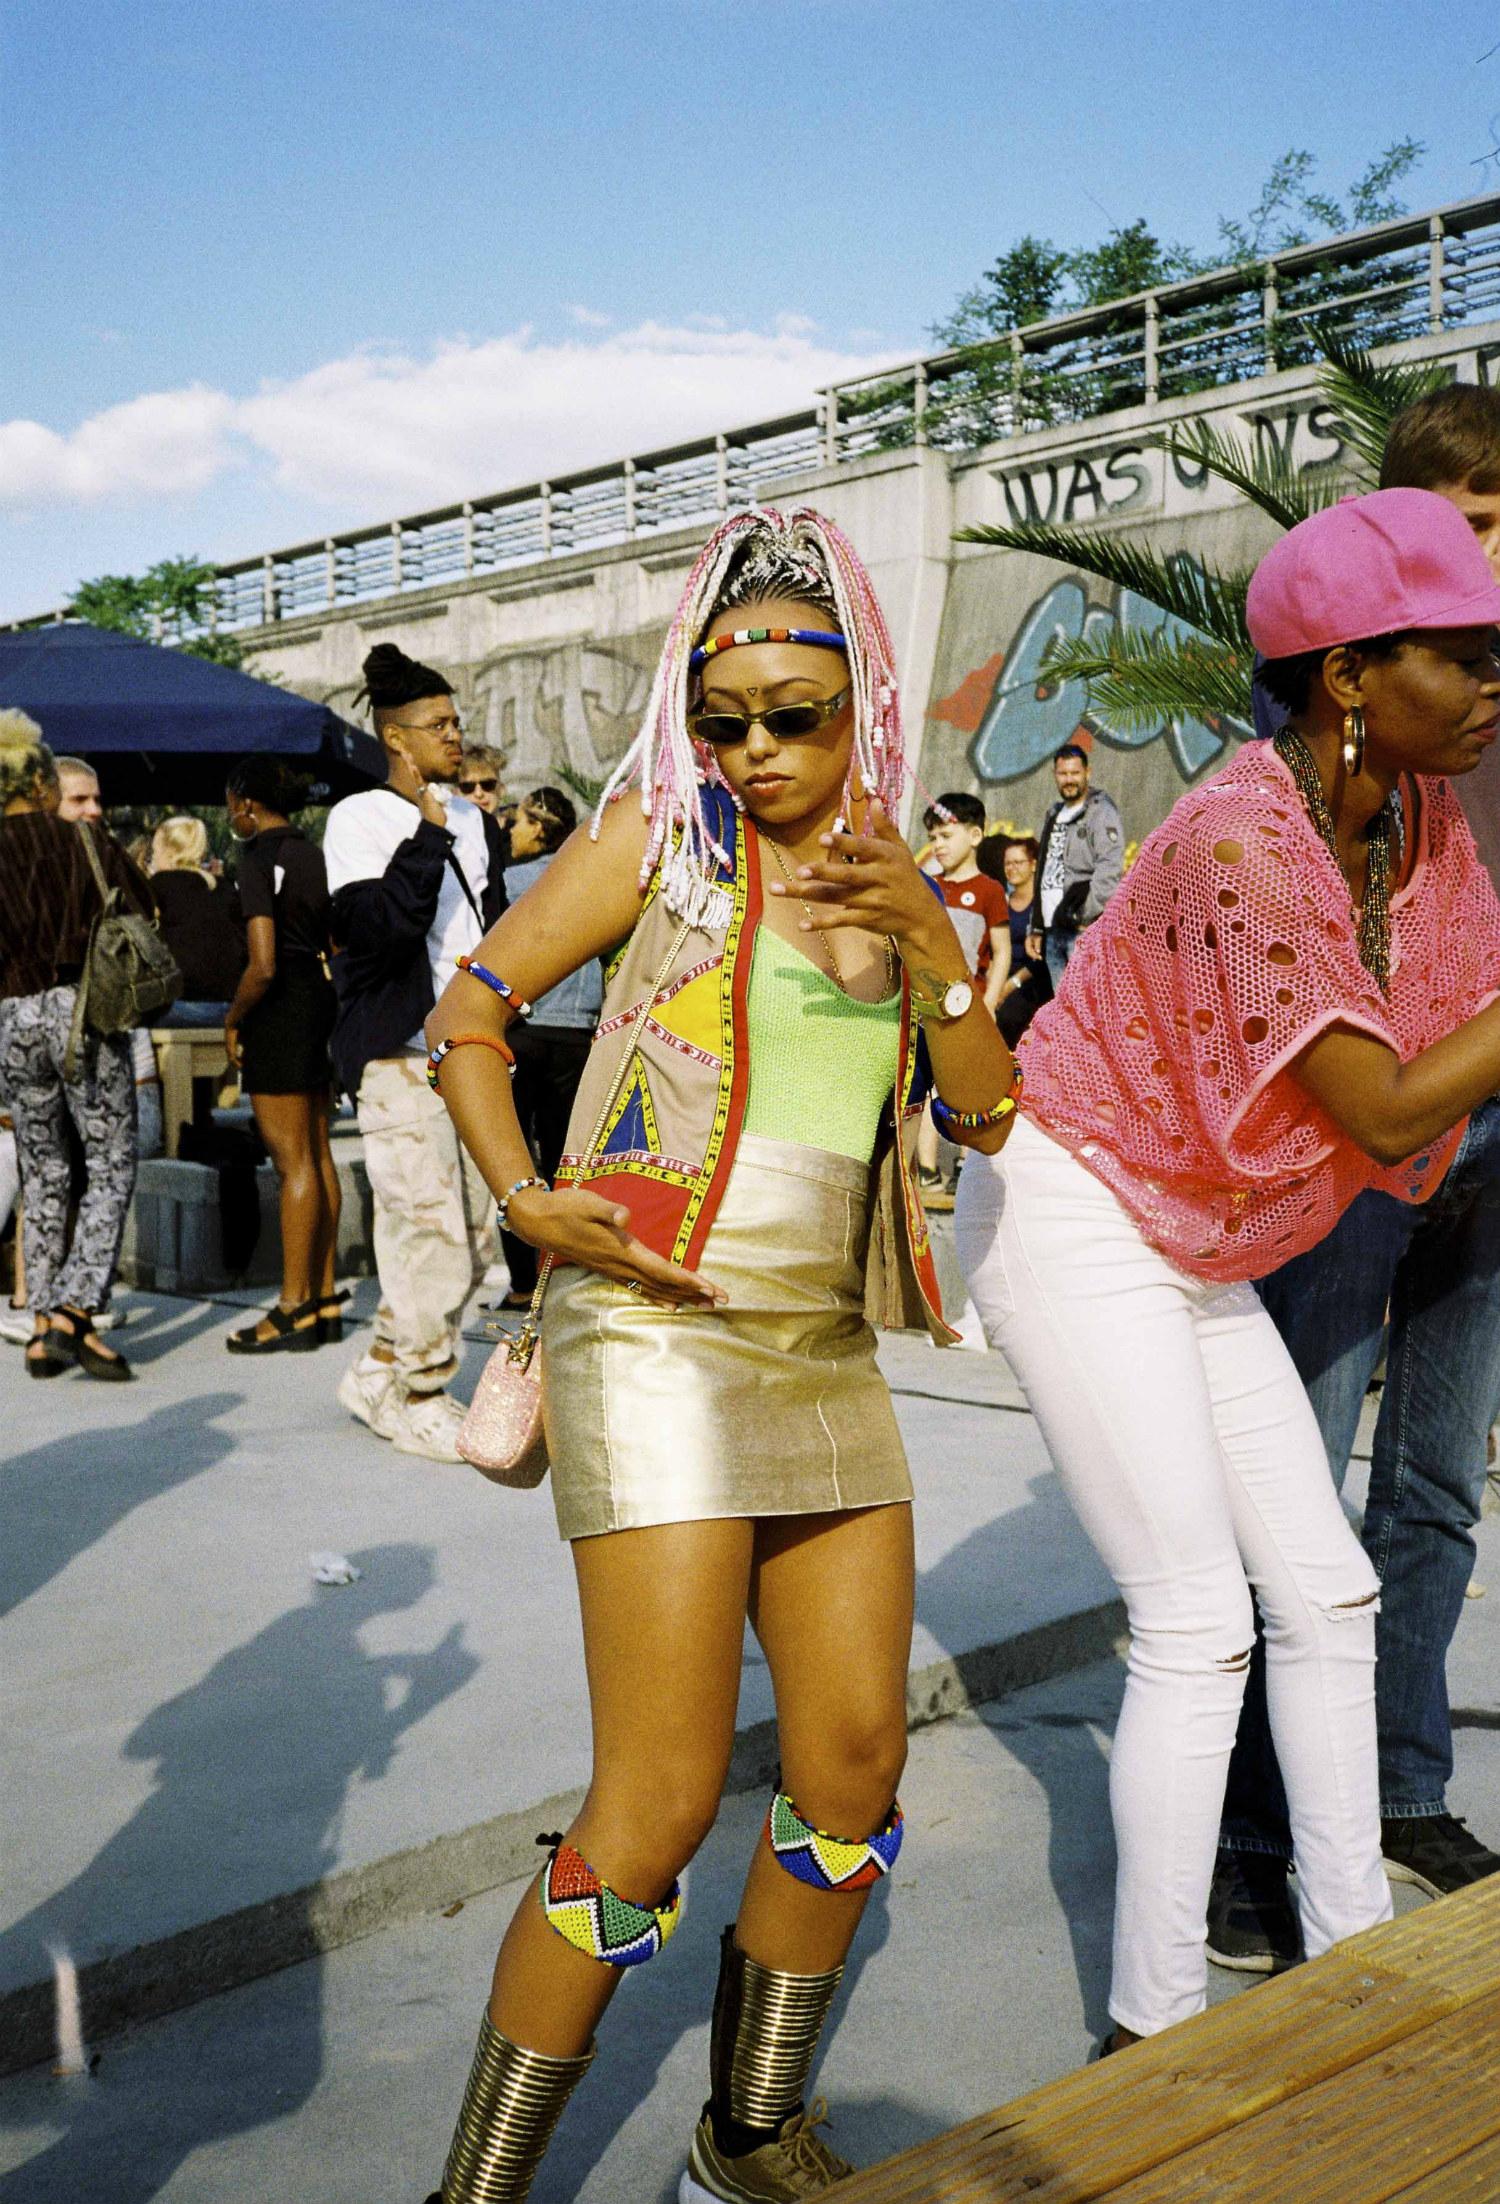 DJ DOOWAP BERLIN MUSIC SOUTH AFRICA BEHIND THE SCENES PHOTOGRAPHY NICK STRUTSI